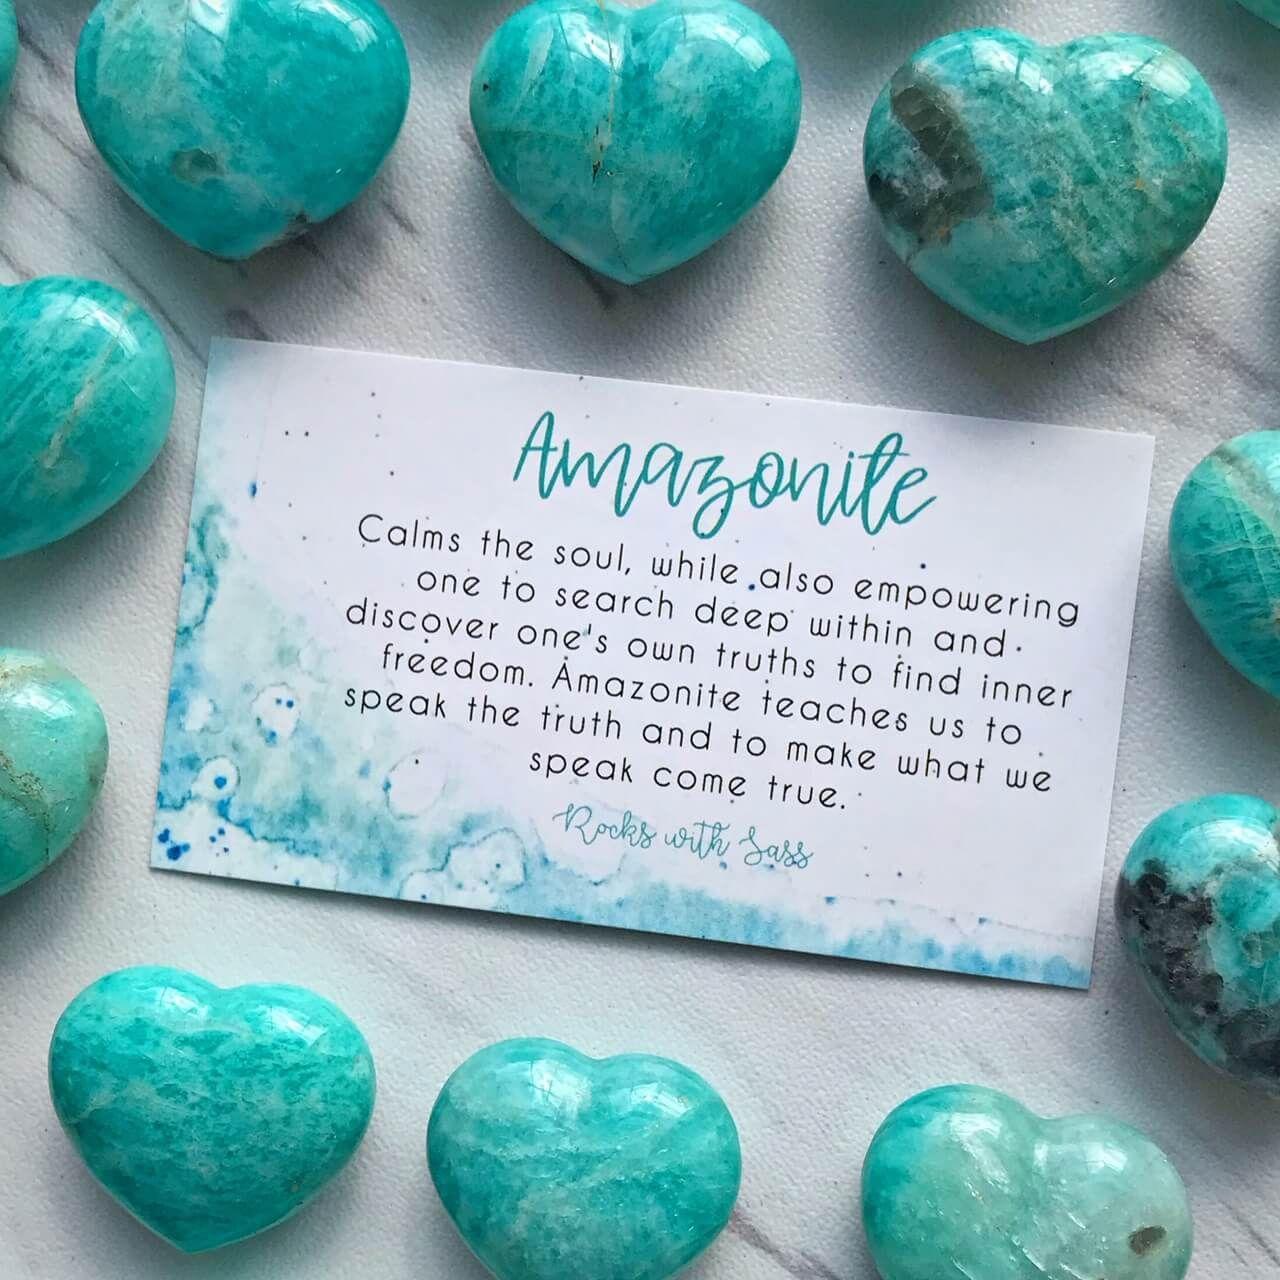 Amazonite Rockswithsass Com Spiritual Crystals Crystal